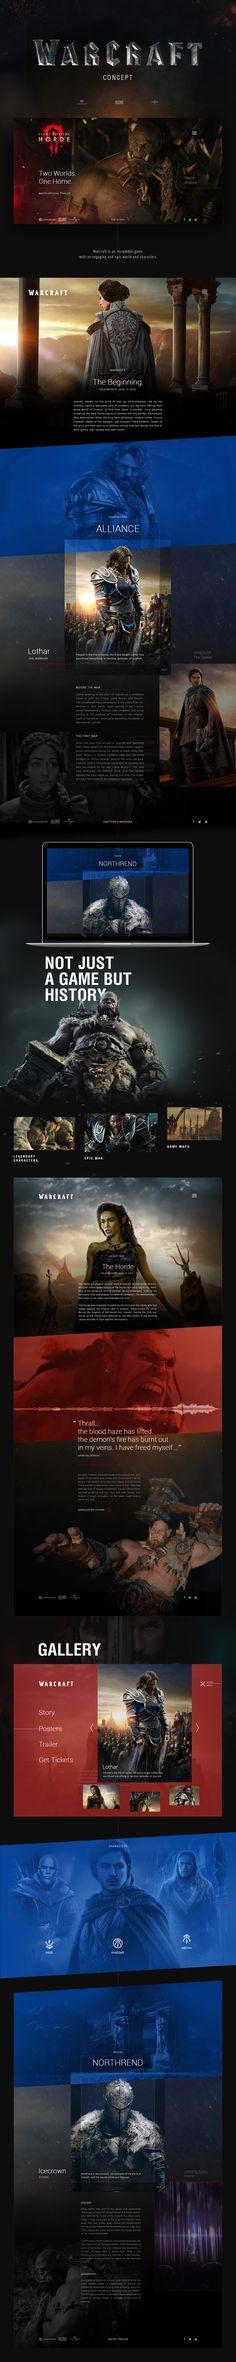 movie ' warcraft ' promotion site